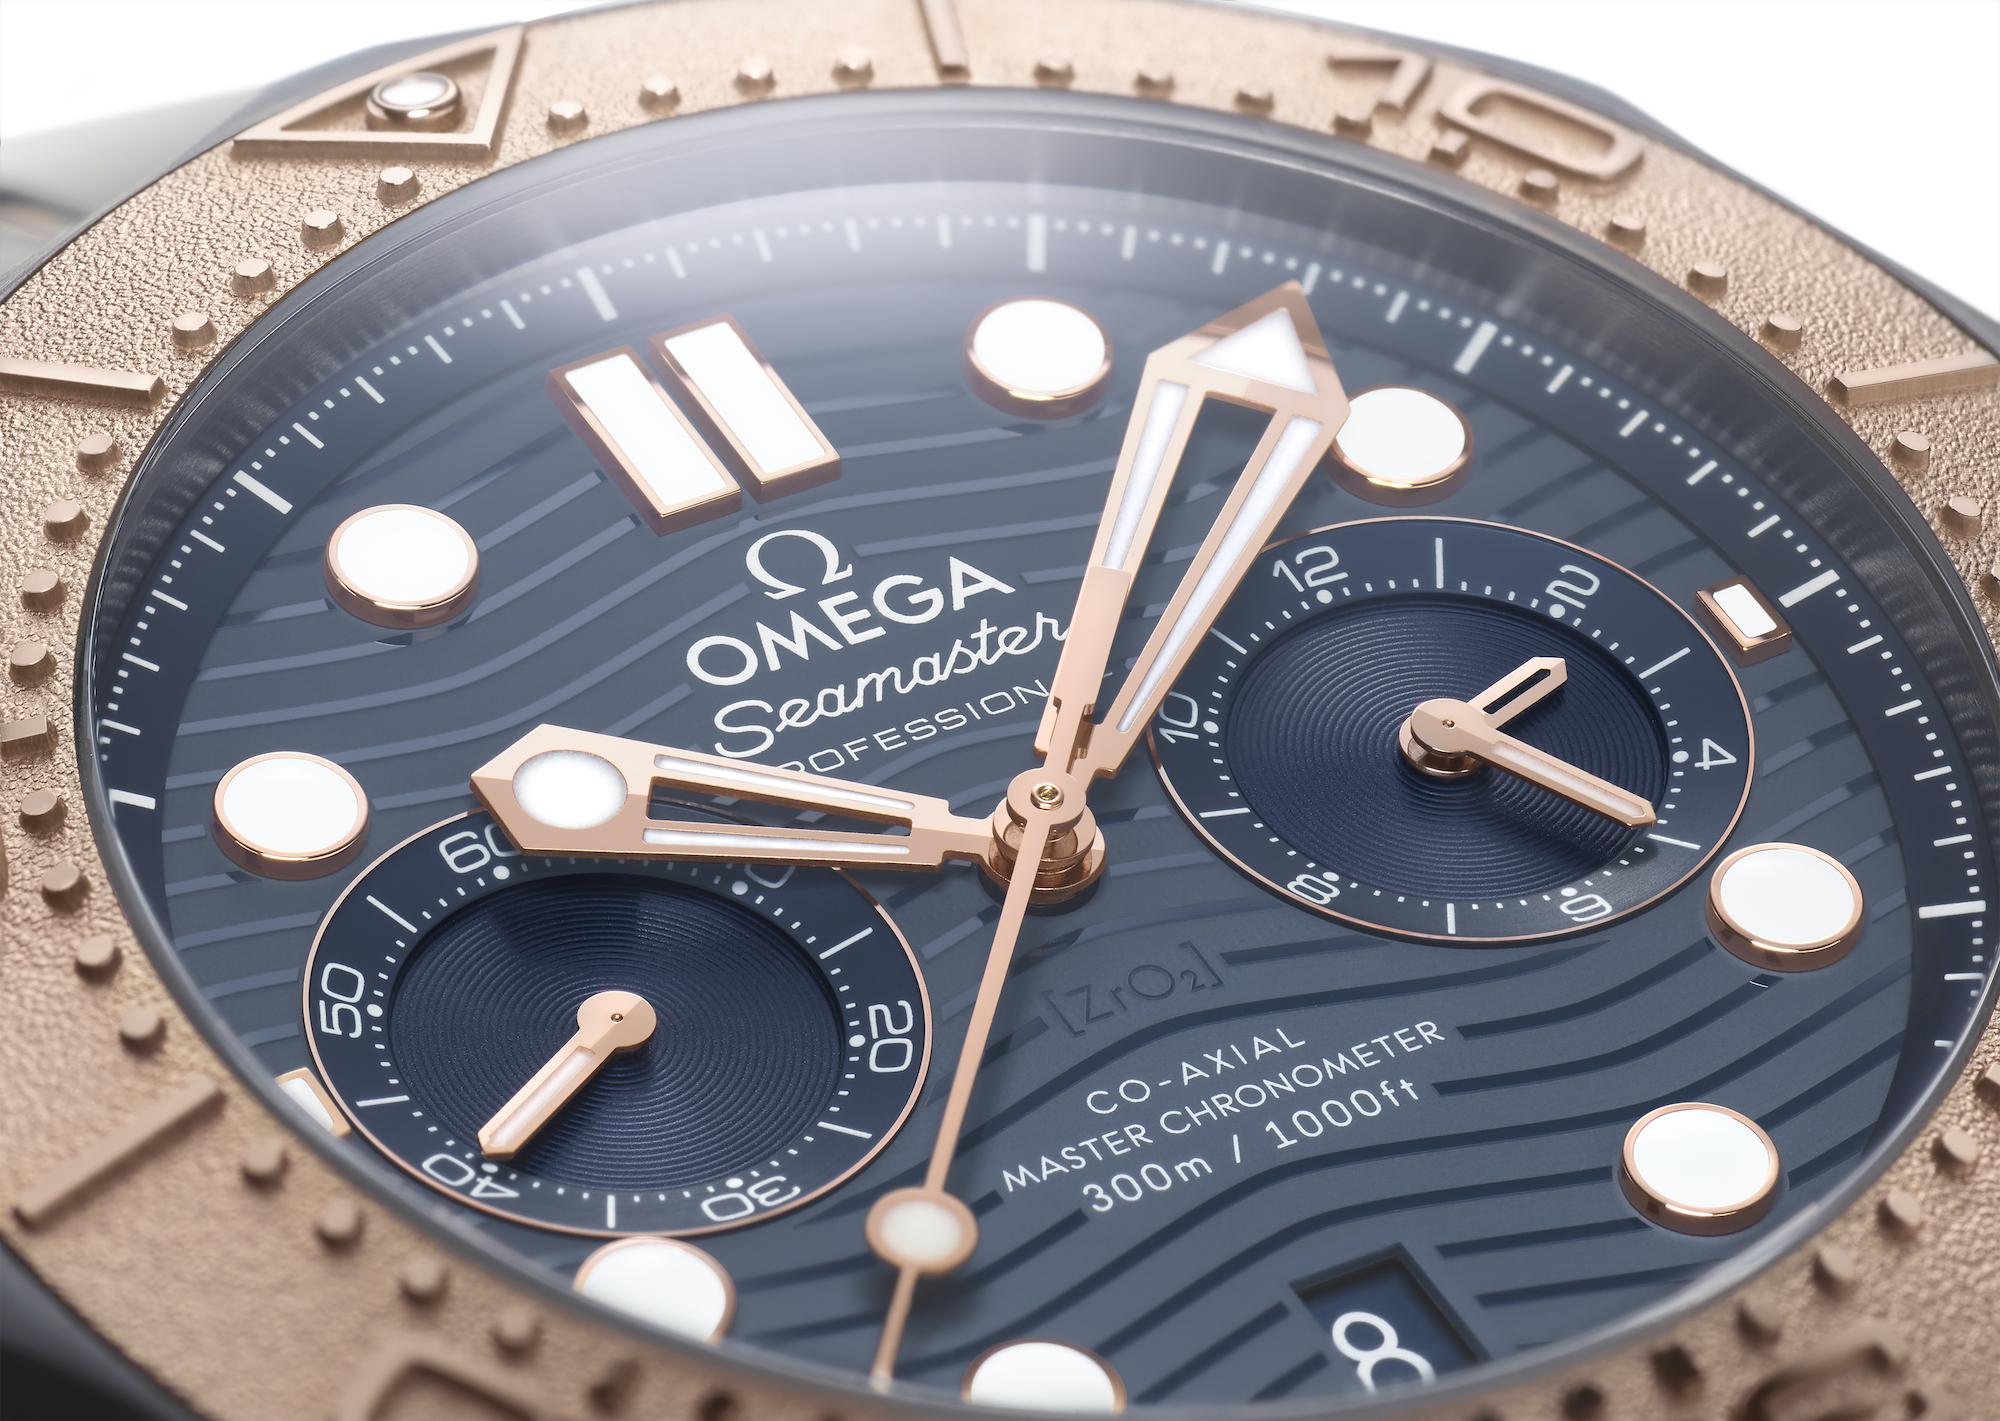 Omega Seamaster Diver 300M Chronograph oro titanio tantalio 210.60.44.51.03.001 detalle esfera